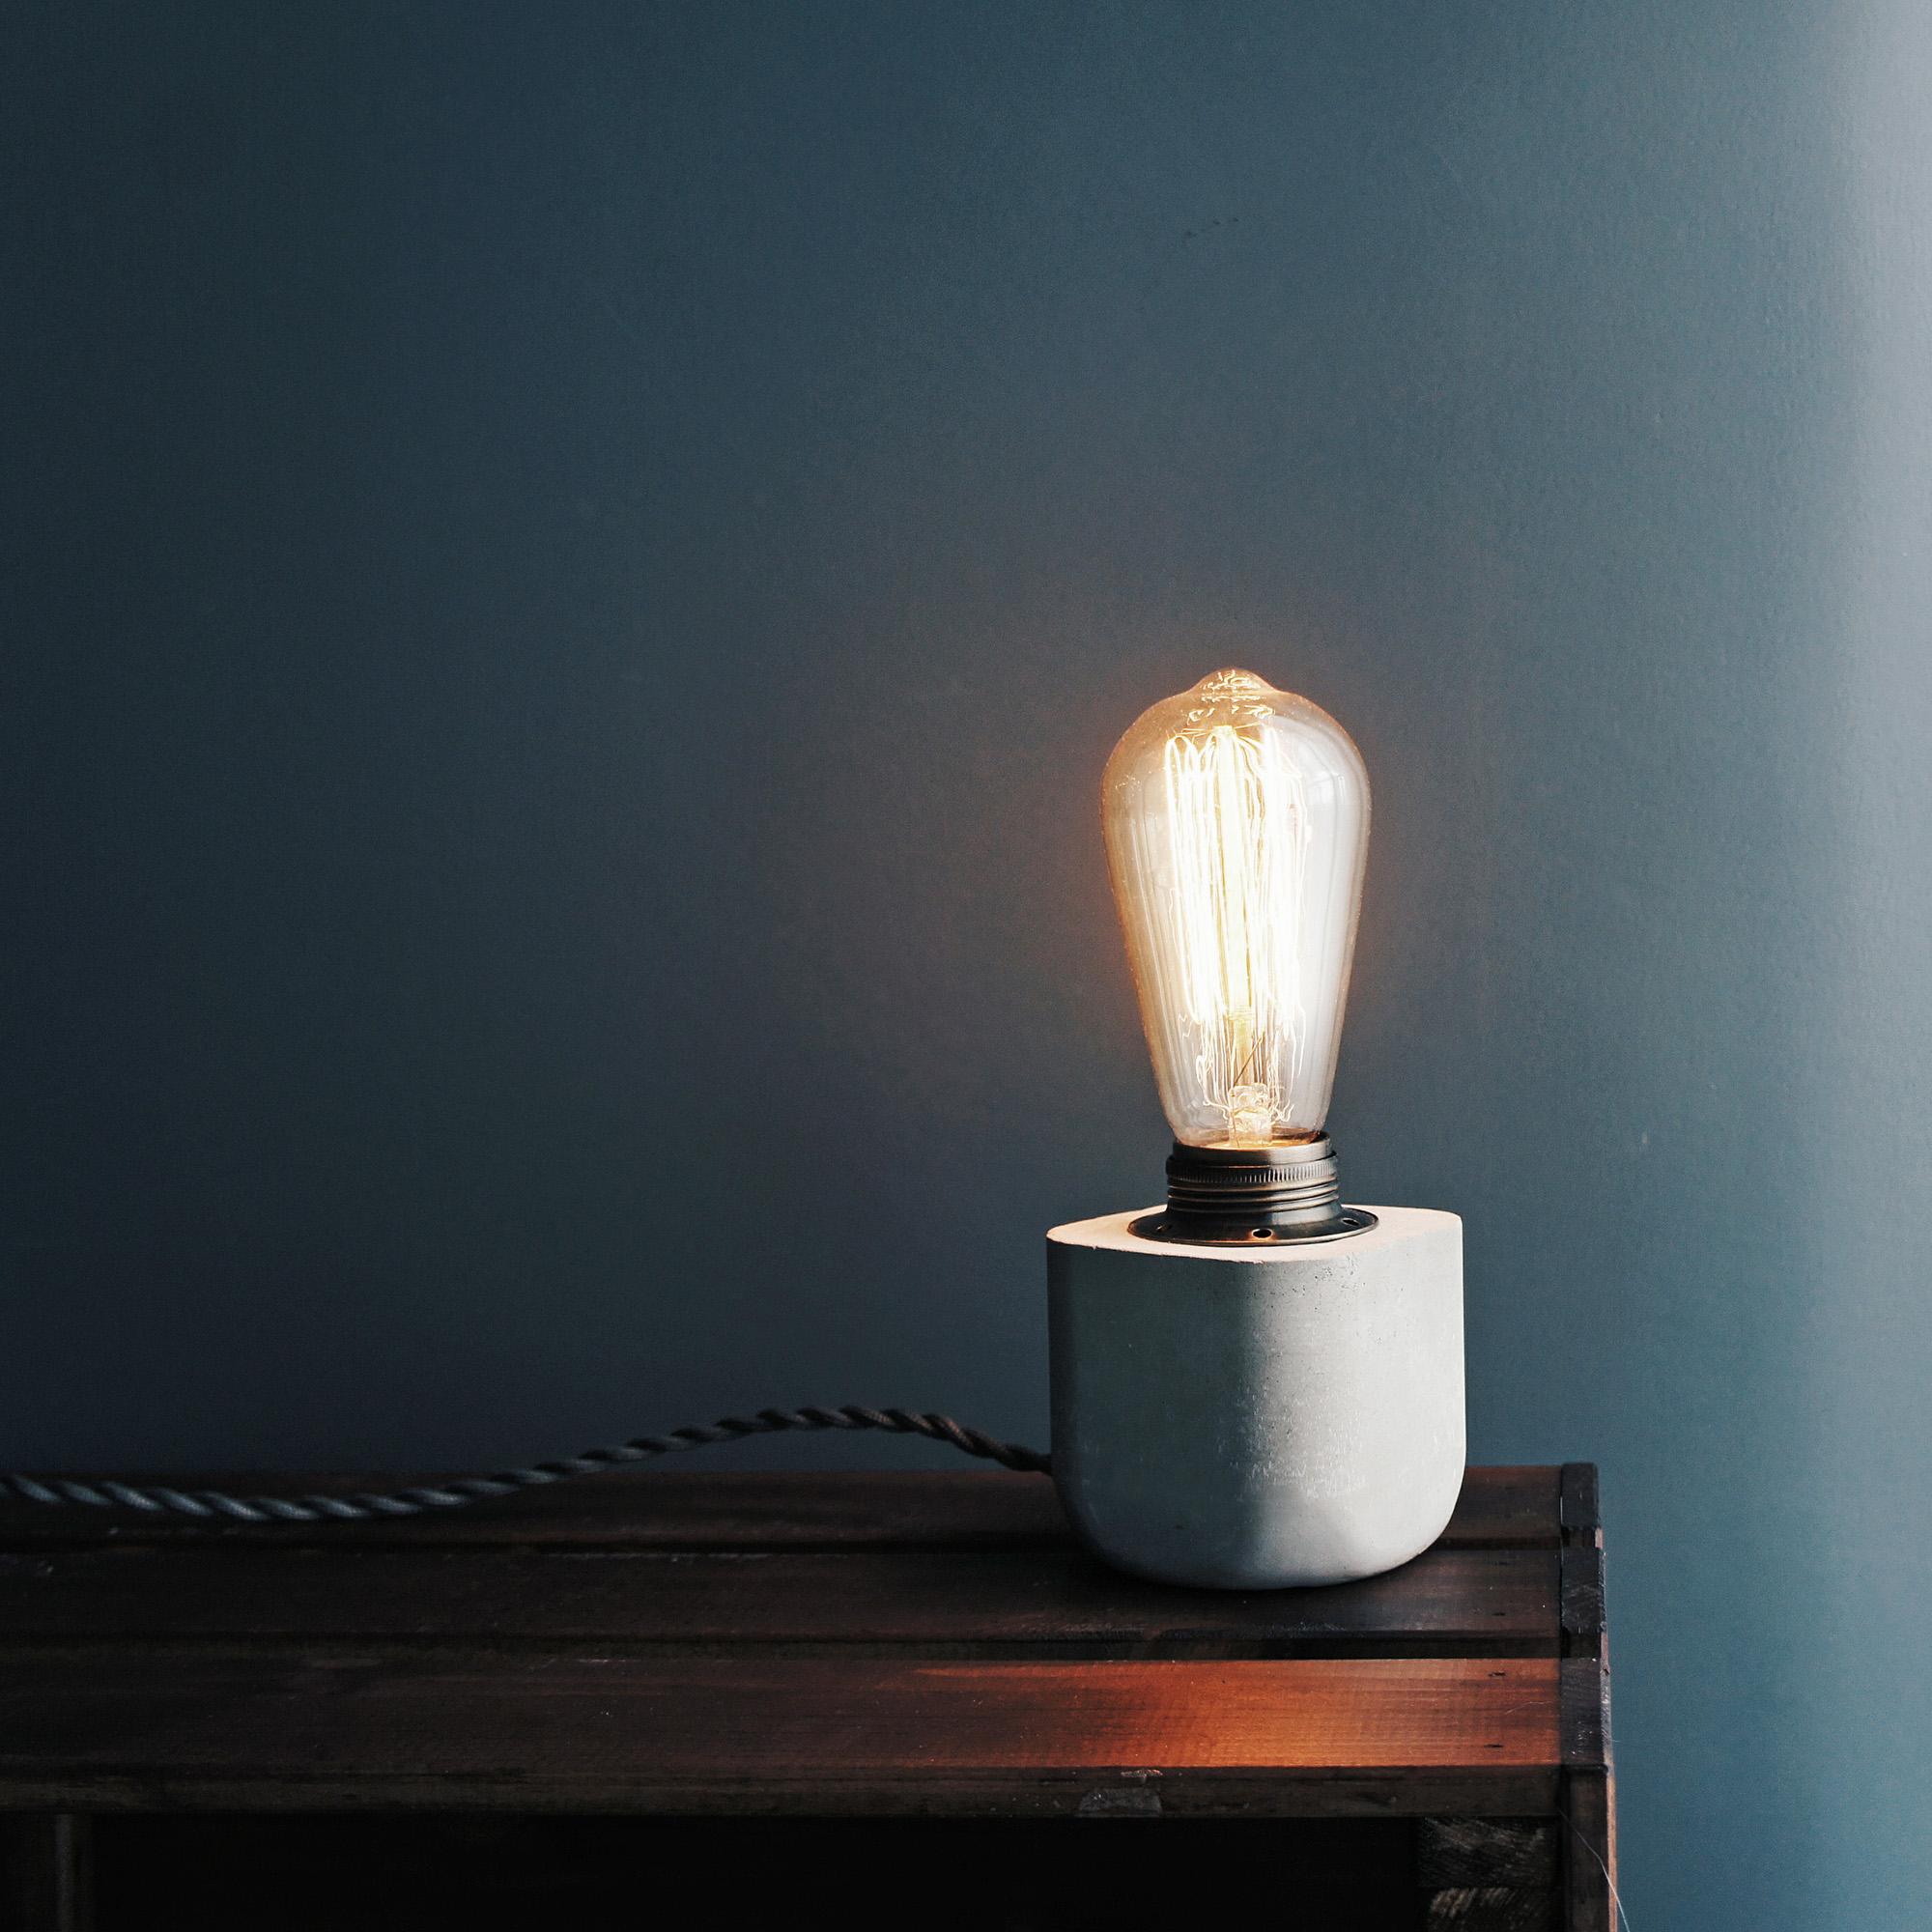 Home Decor 水泥燈飾・居家擺飾・設計禮物